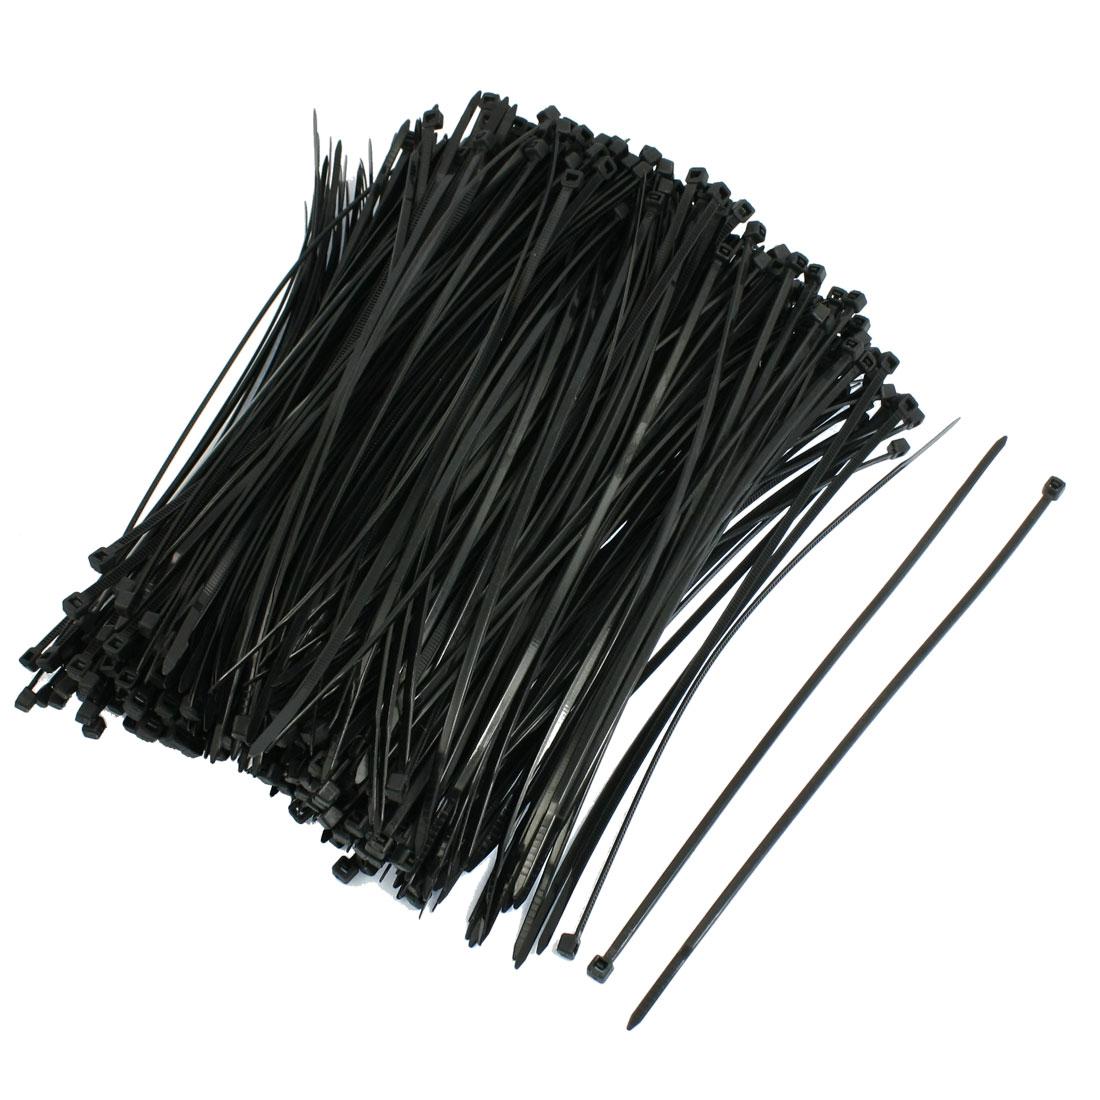 500 Pcs 3mm x 200mm Wire Cable Wrap Strap Tie Fastener Organizer Black